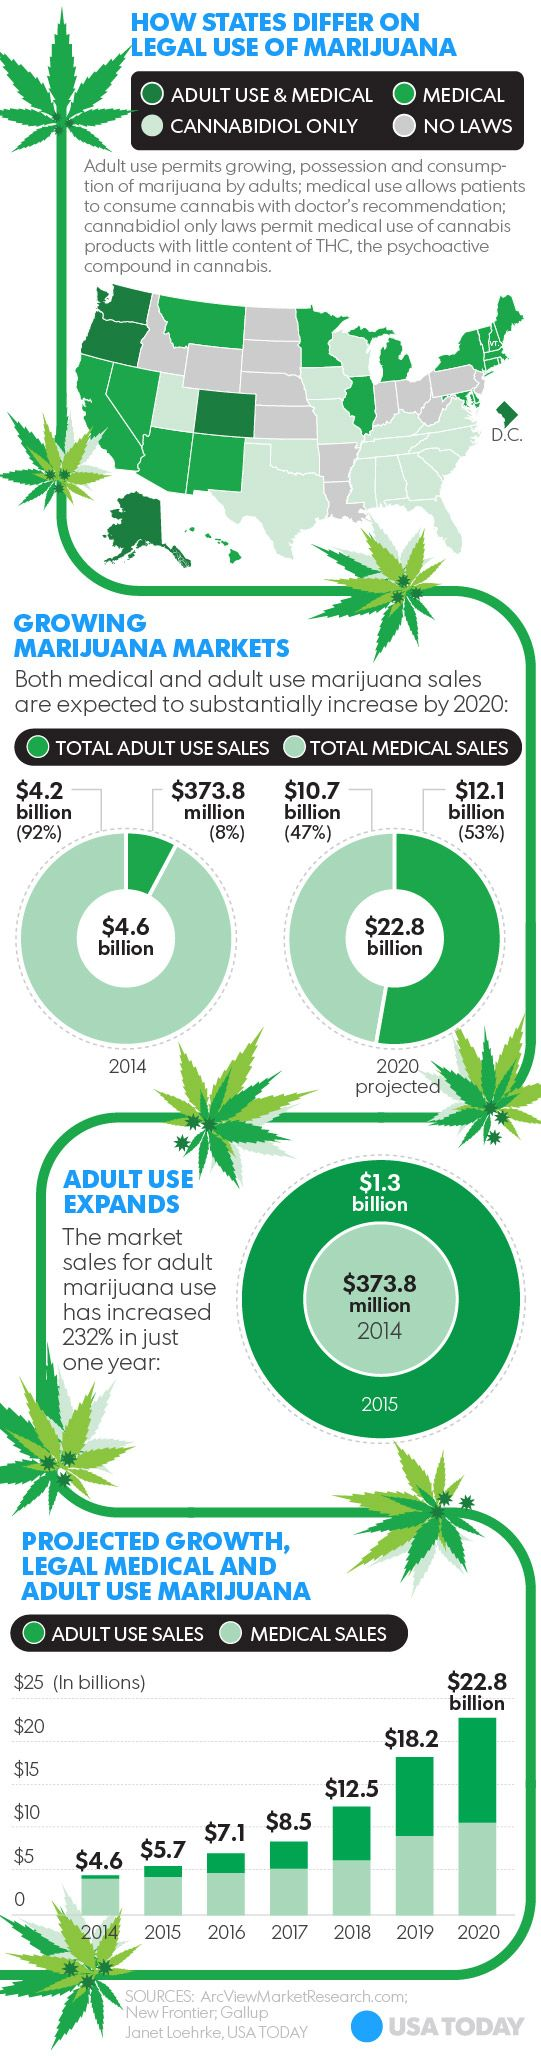 Legal marijuana sales forecast to hit $23B in 4 years